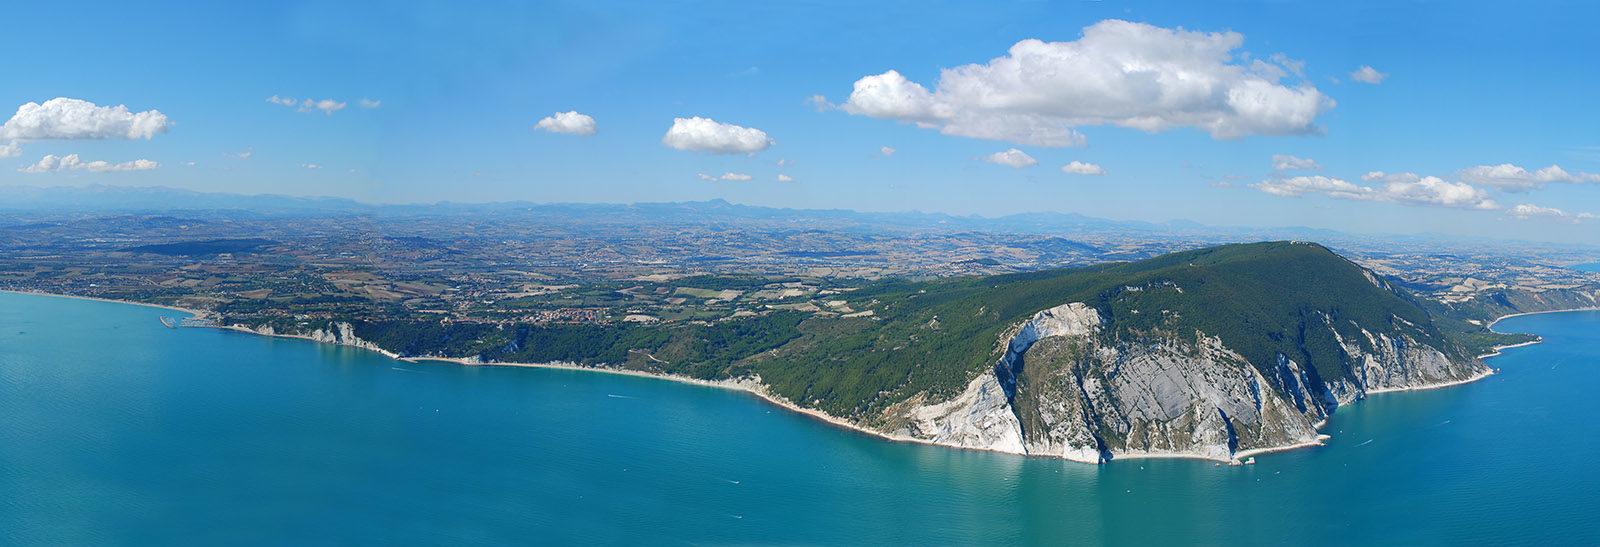 FOTO Panoramica Monte Conero